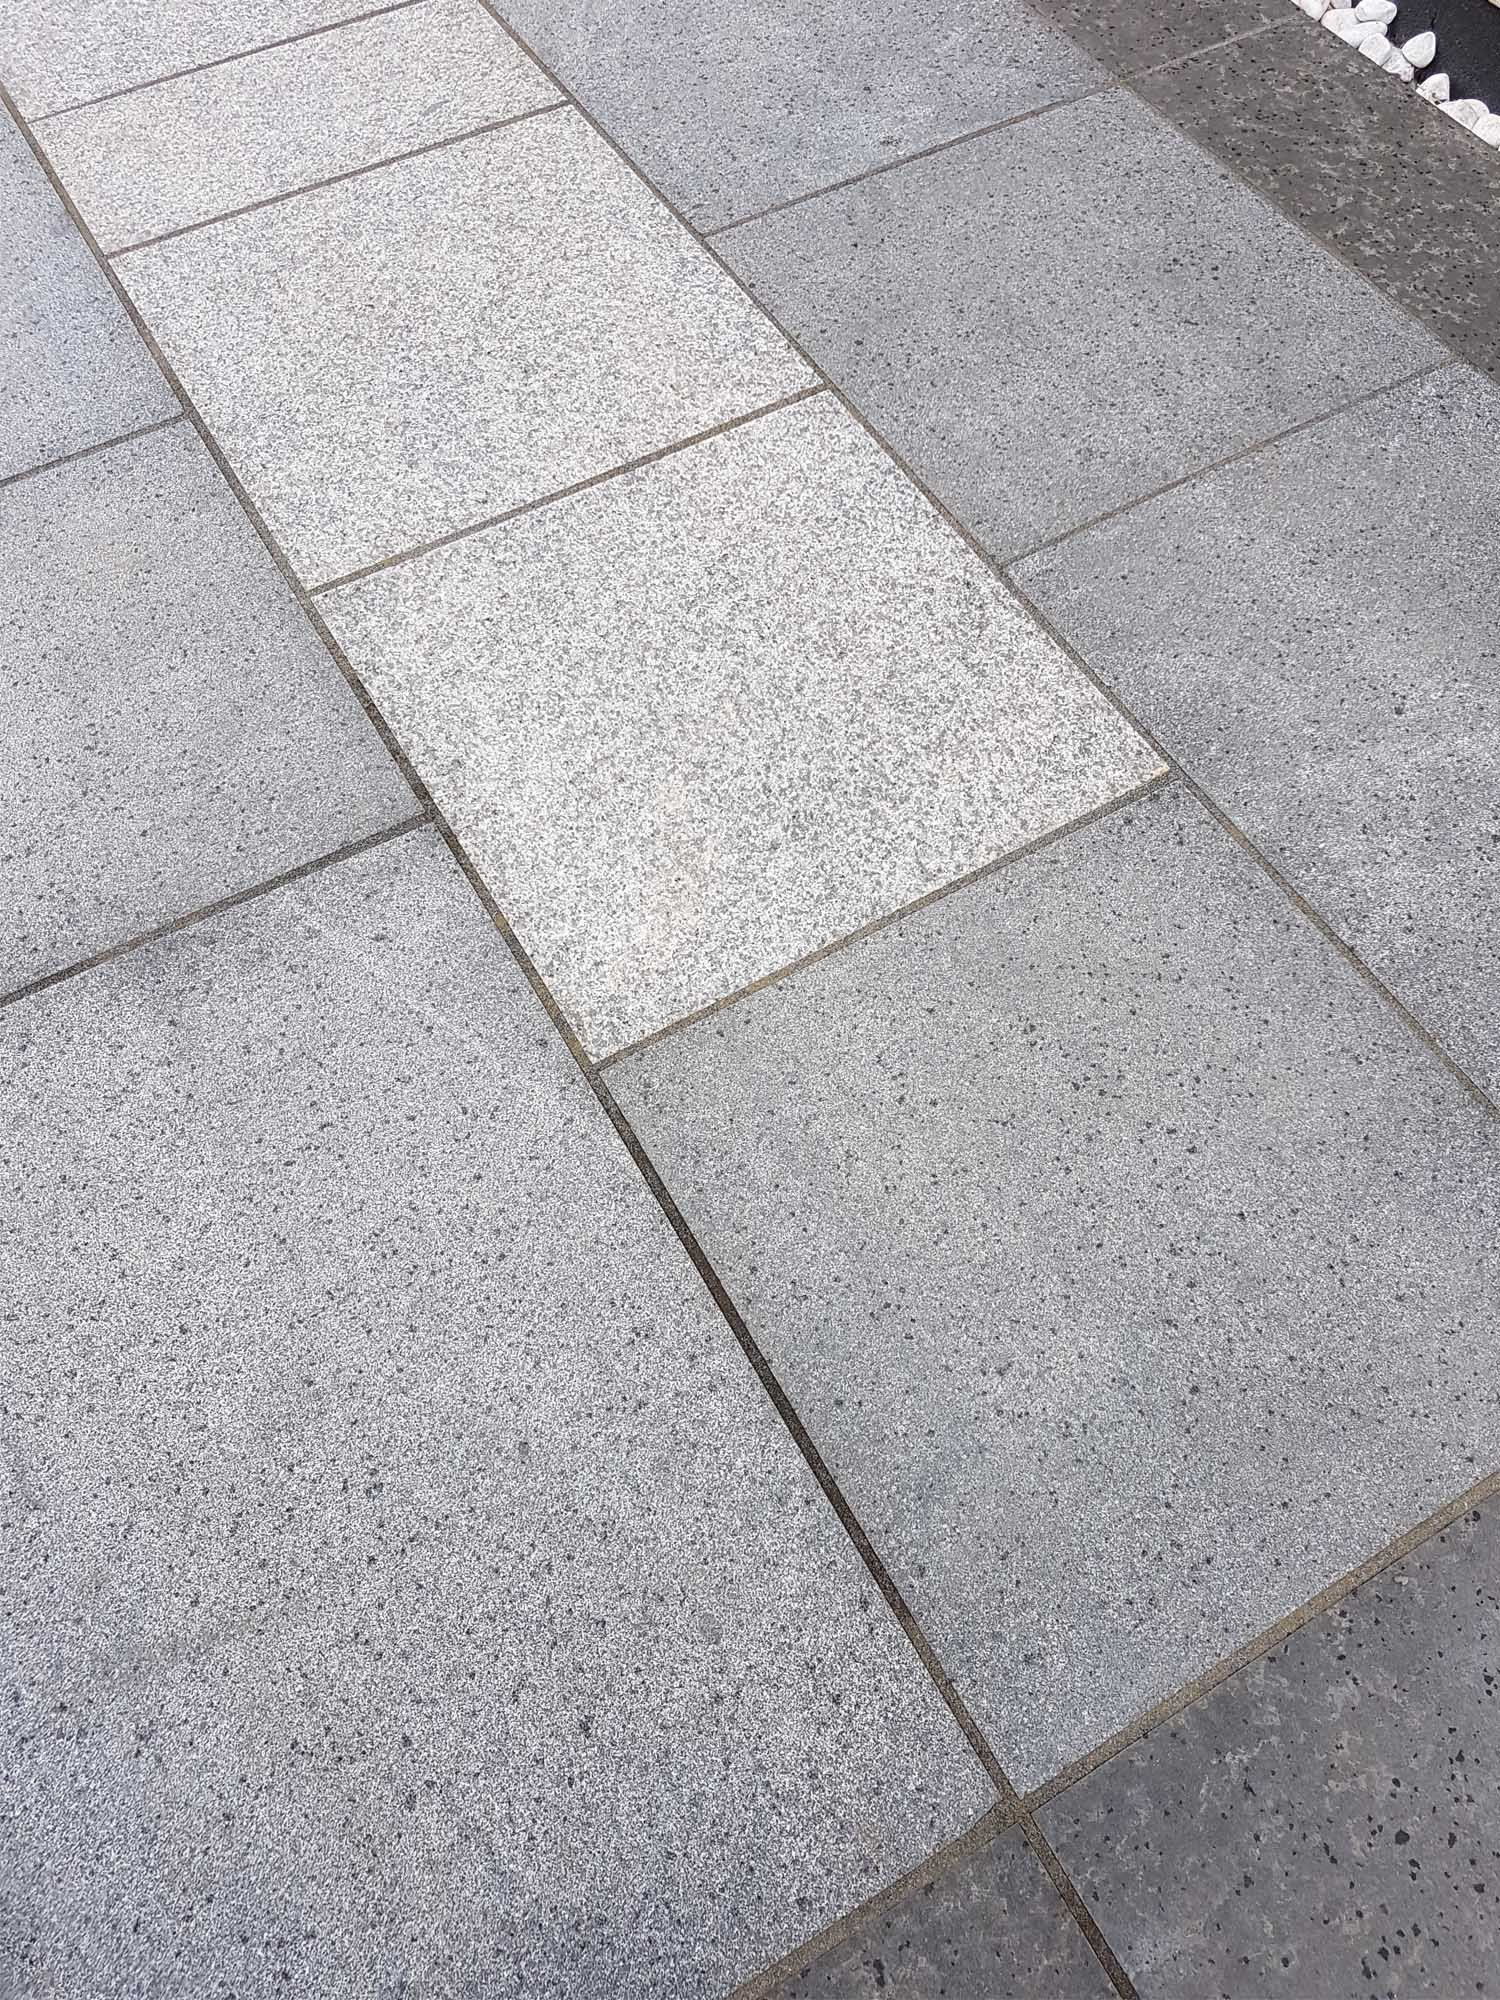 Dark Stone Slabs : Dark grey granite paving mid blue